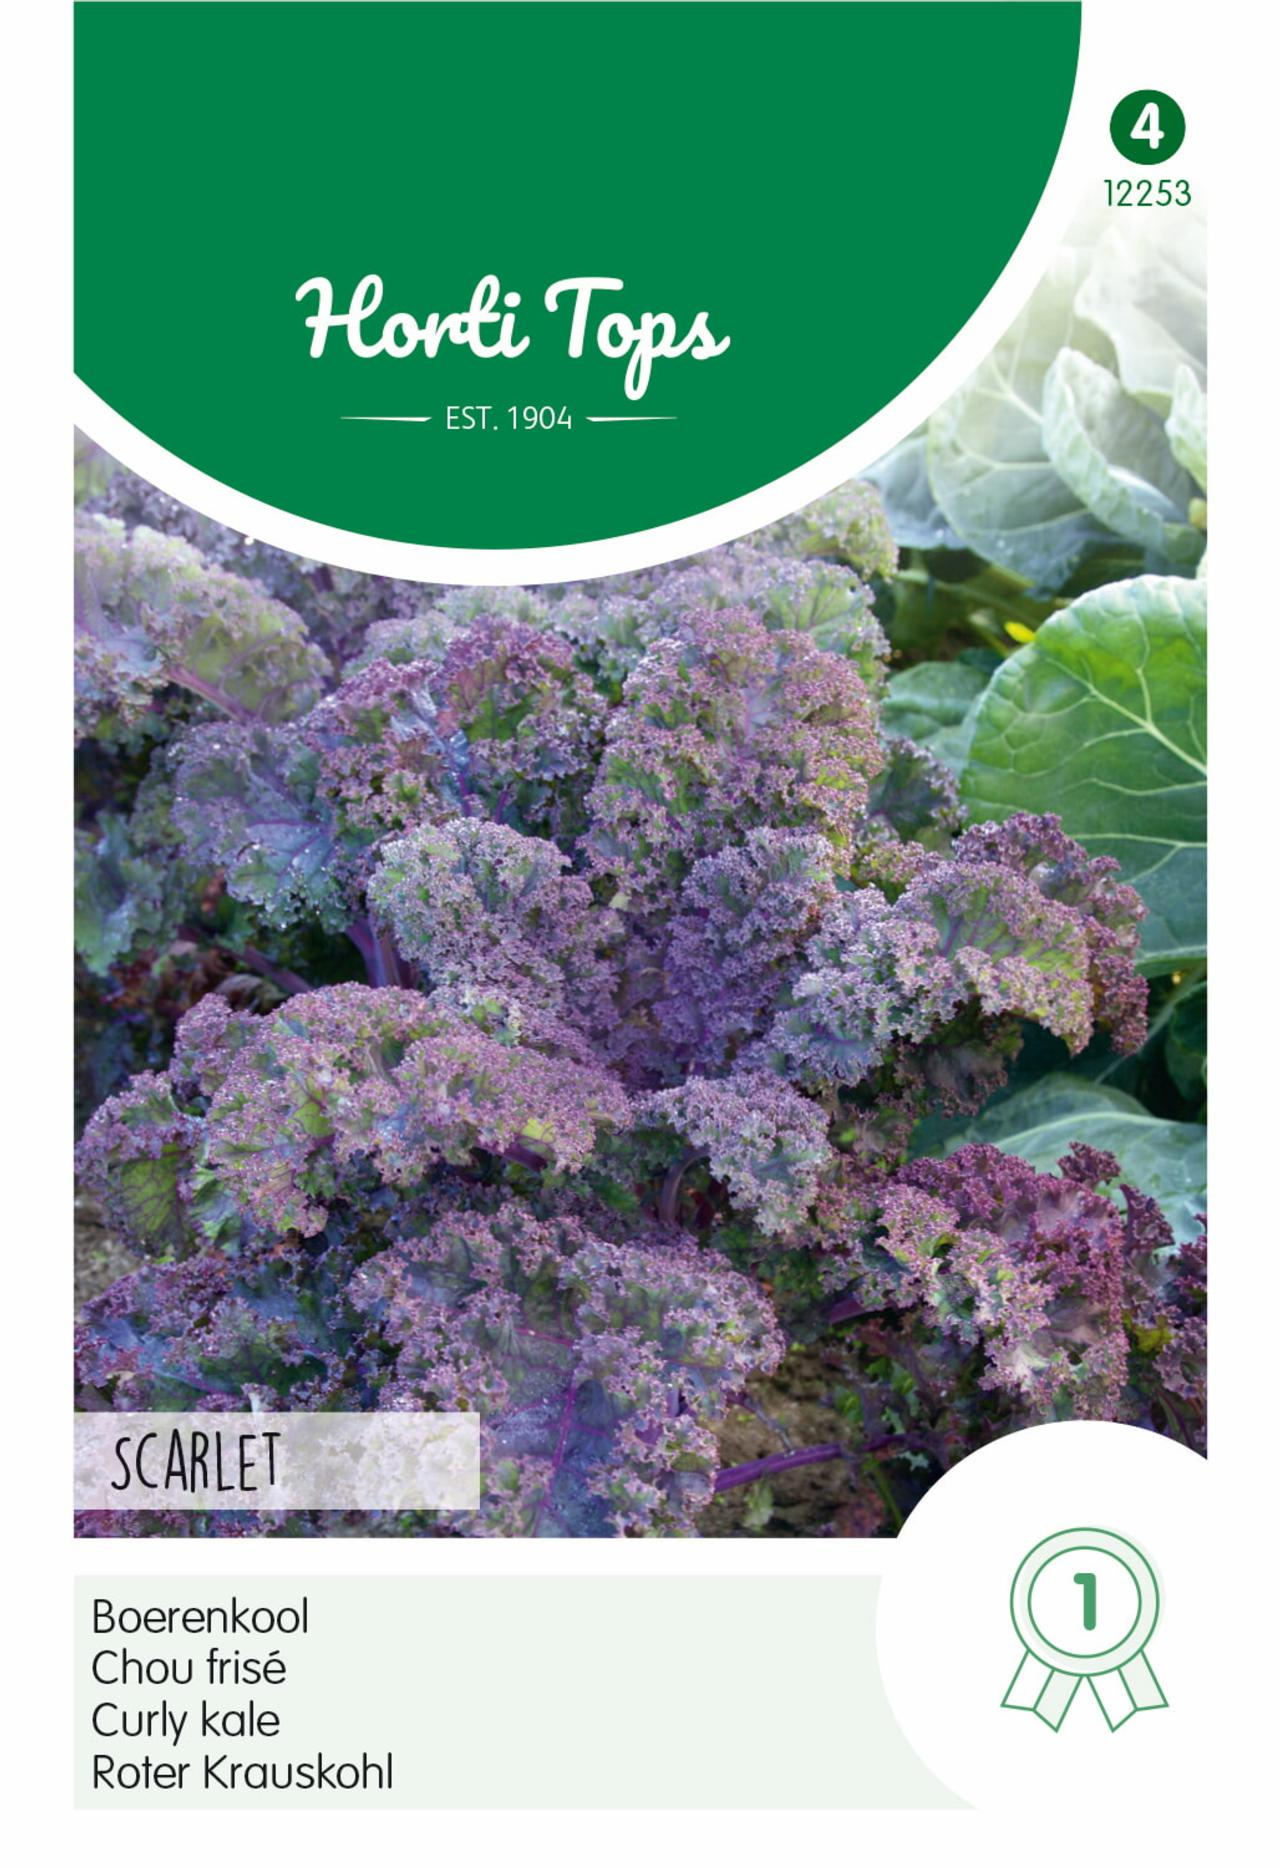 Brassica oleracea 'Scarlet' plant